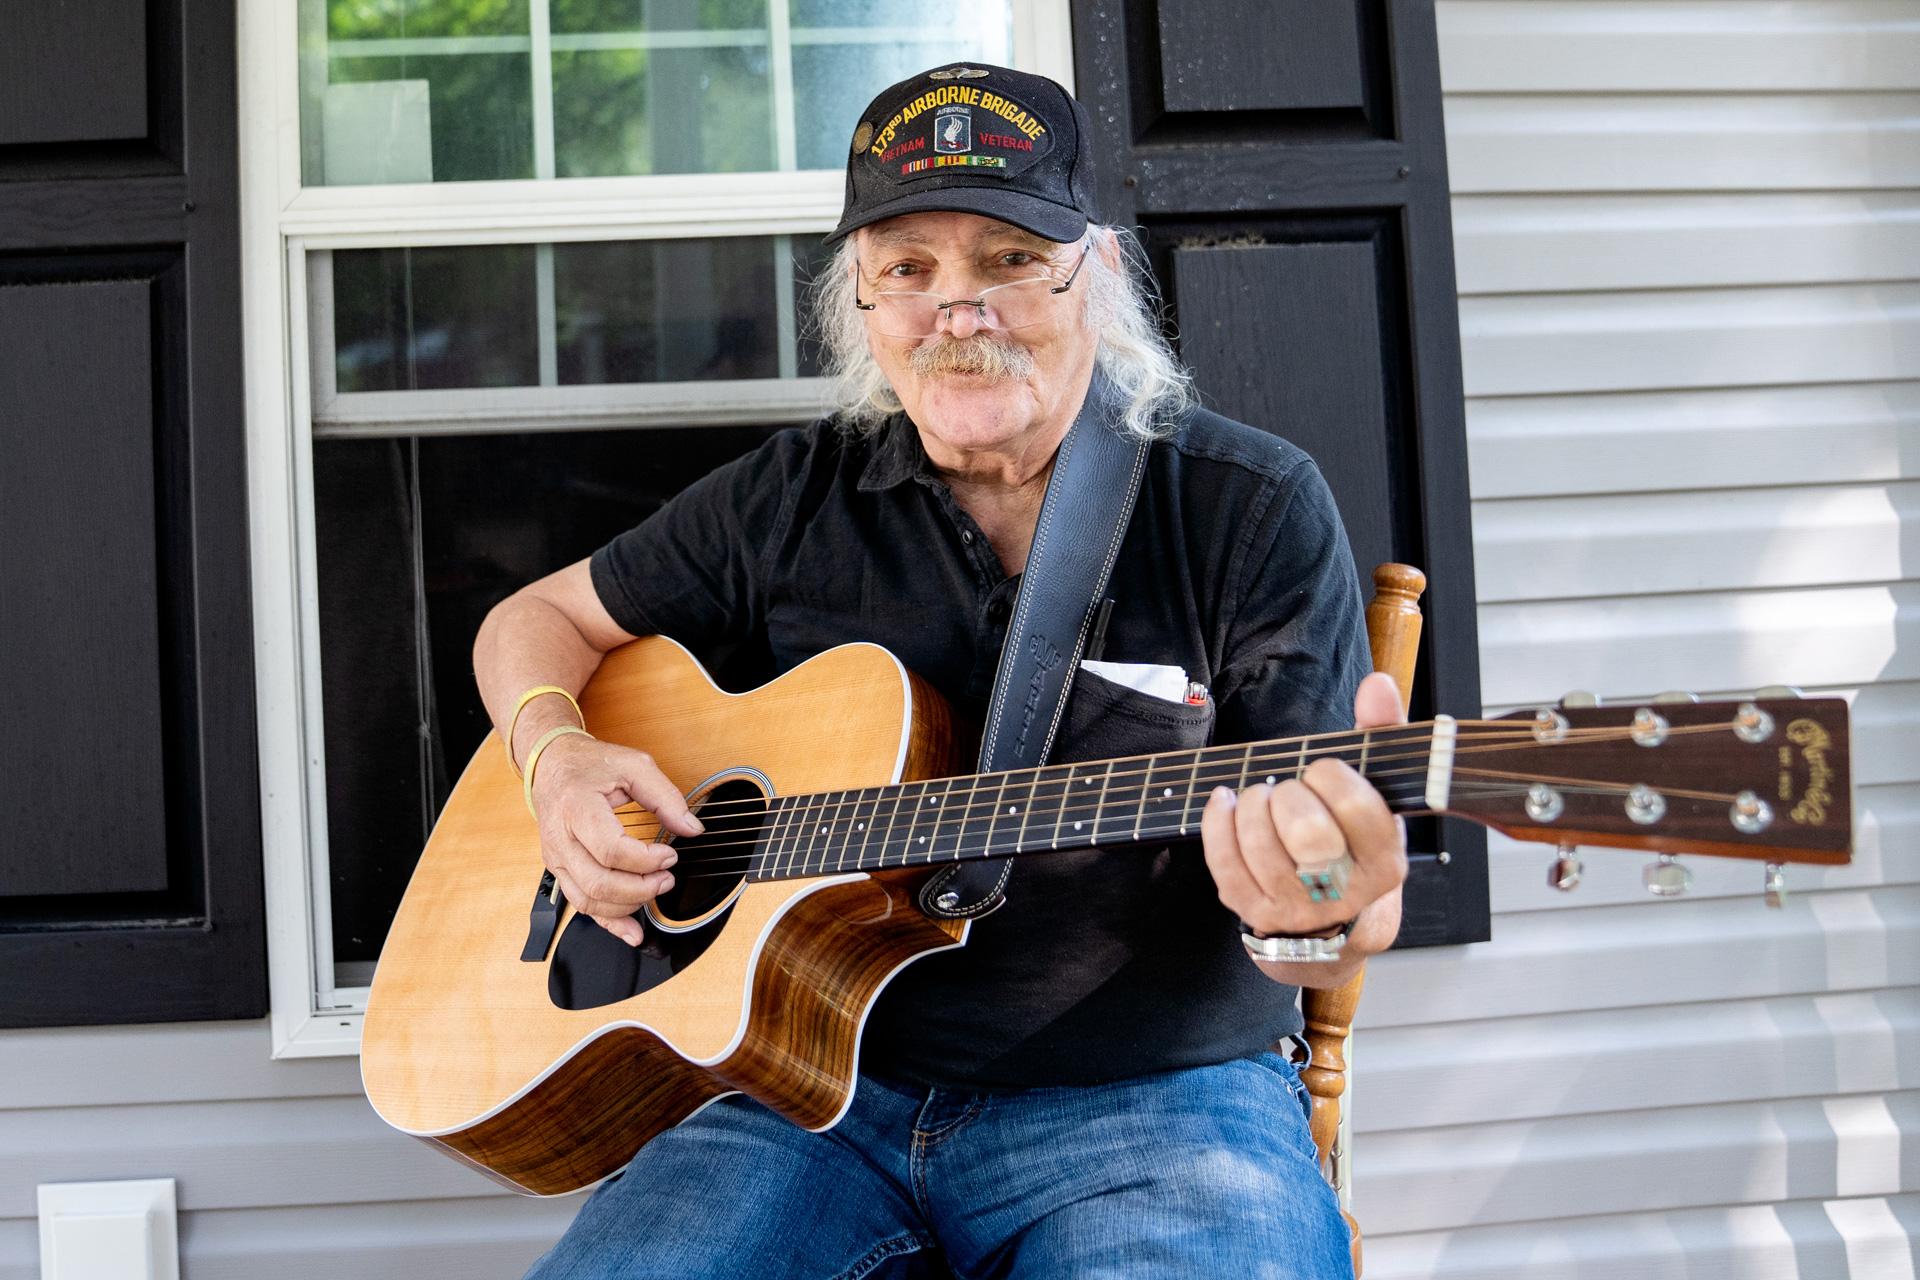 Grey-haired man playing guitar